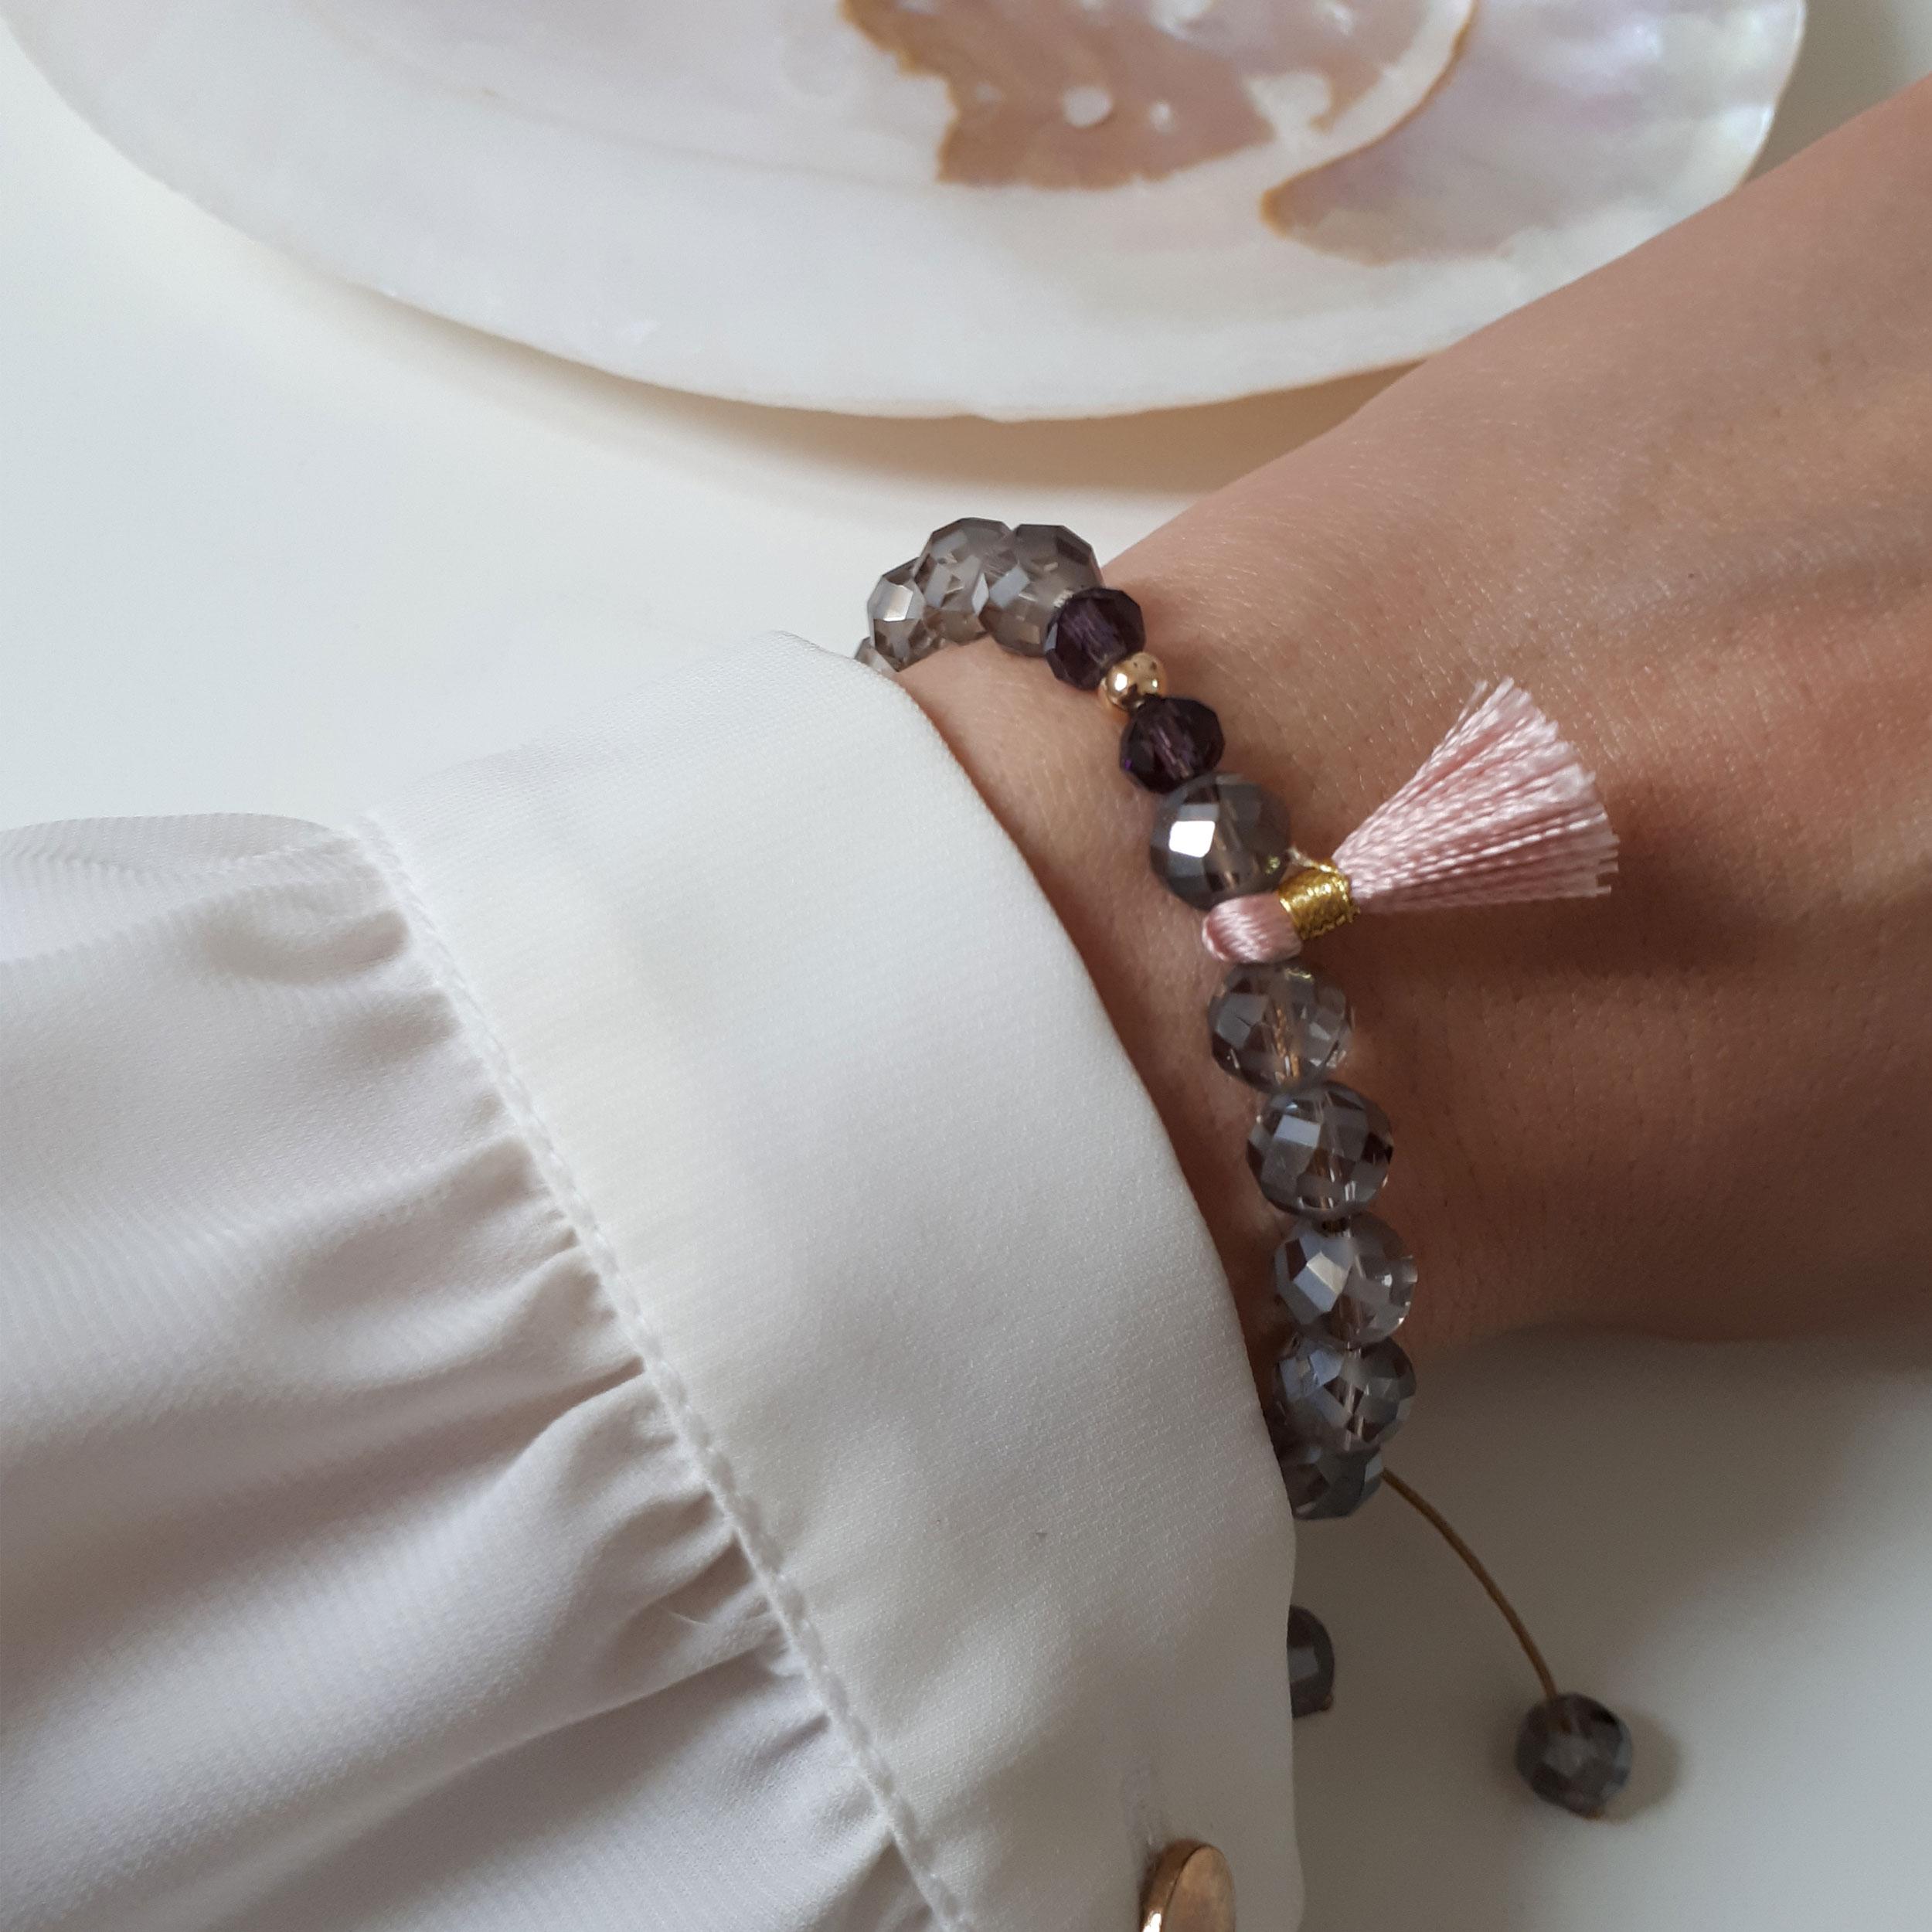 دستبند طلا 18 عیار زنانه الماسین آذر کد Crist02